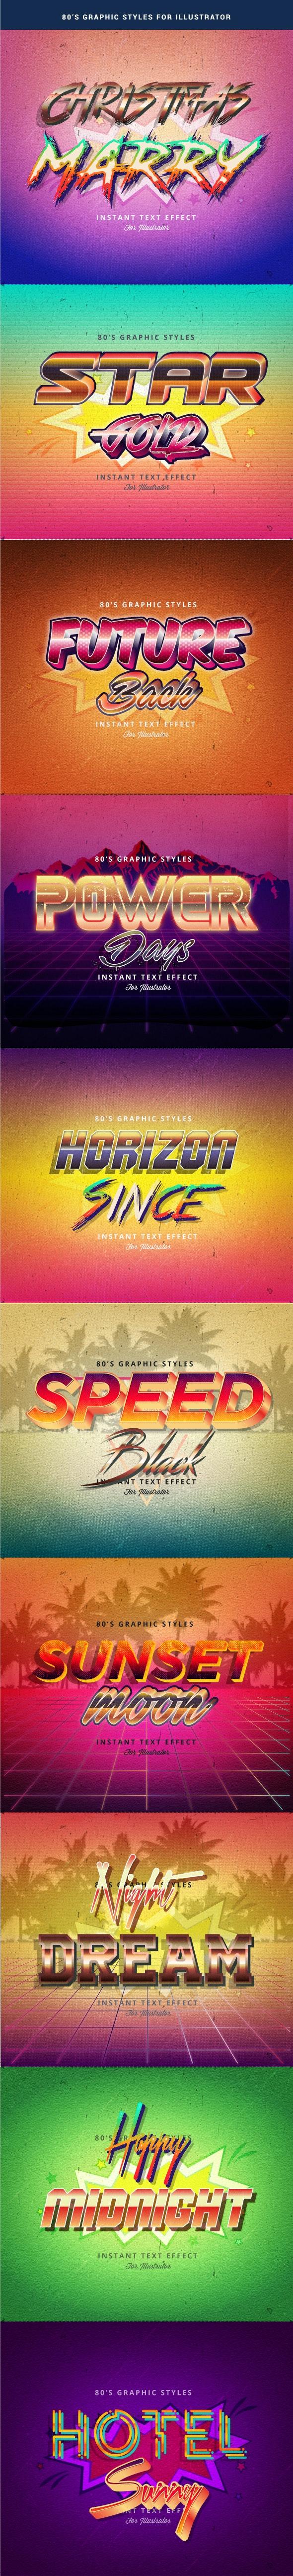 Retro 80's Text Effect for Adobe Illutrator - Styles Illustrator